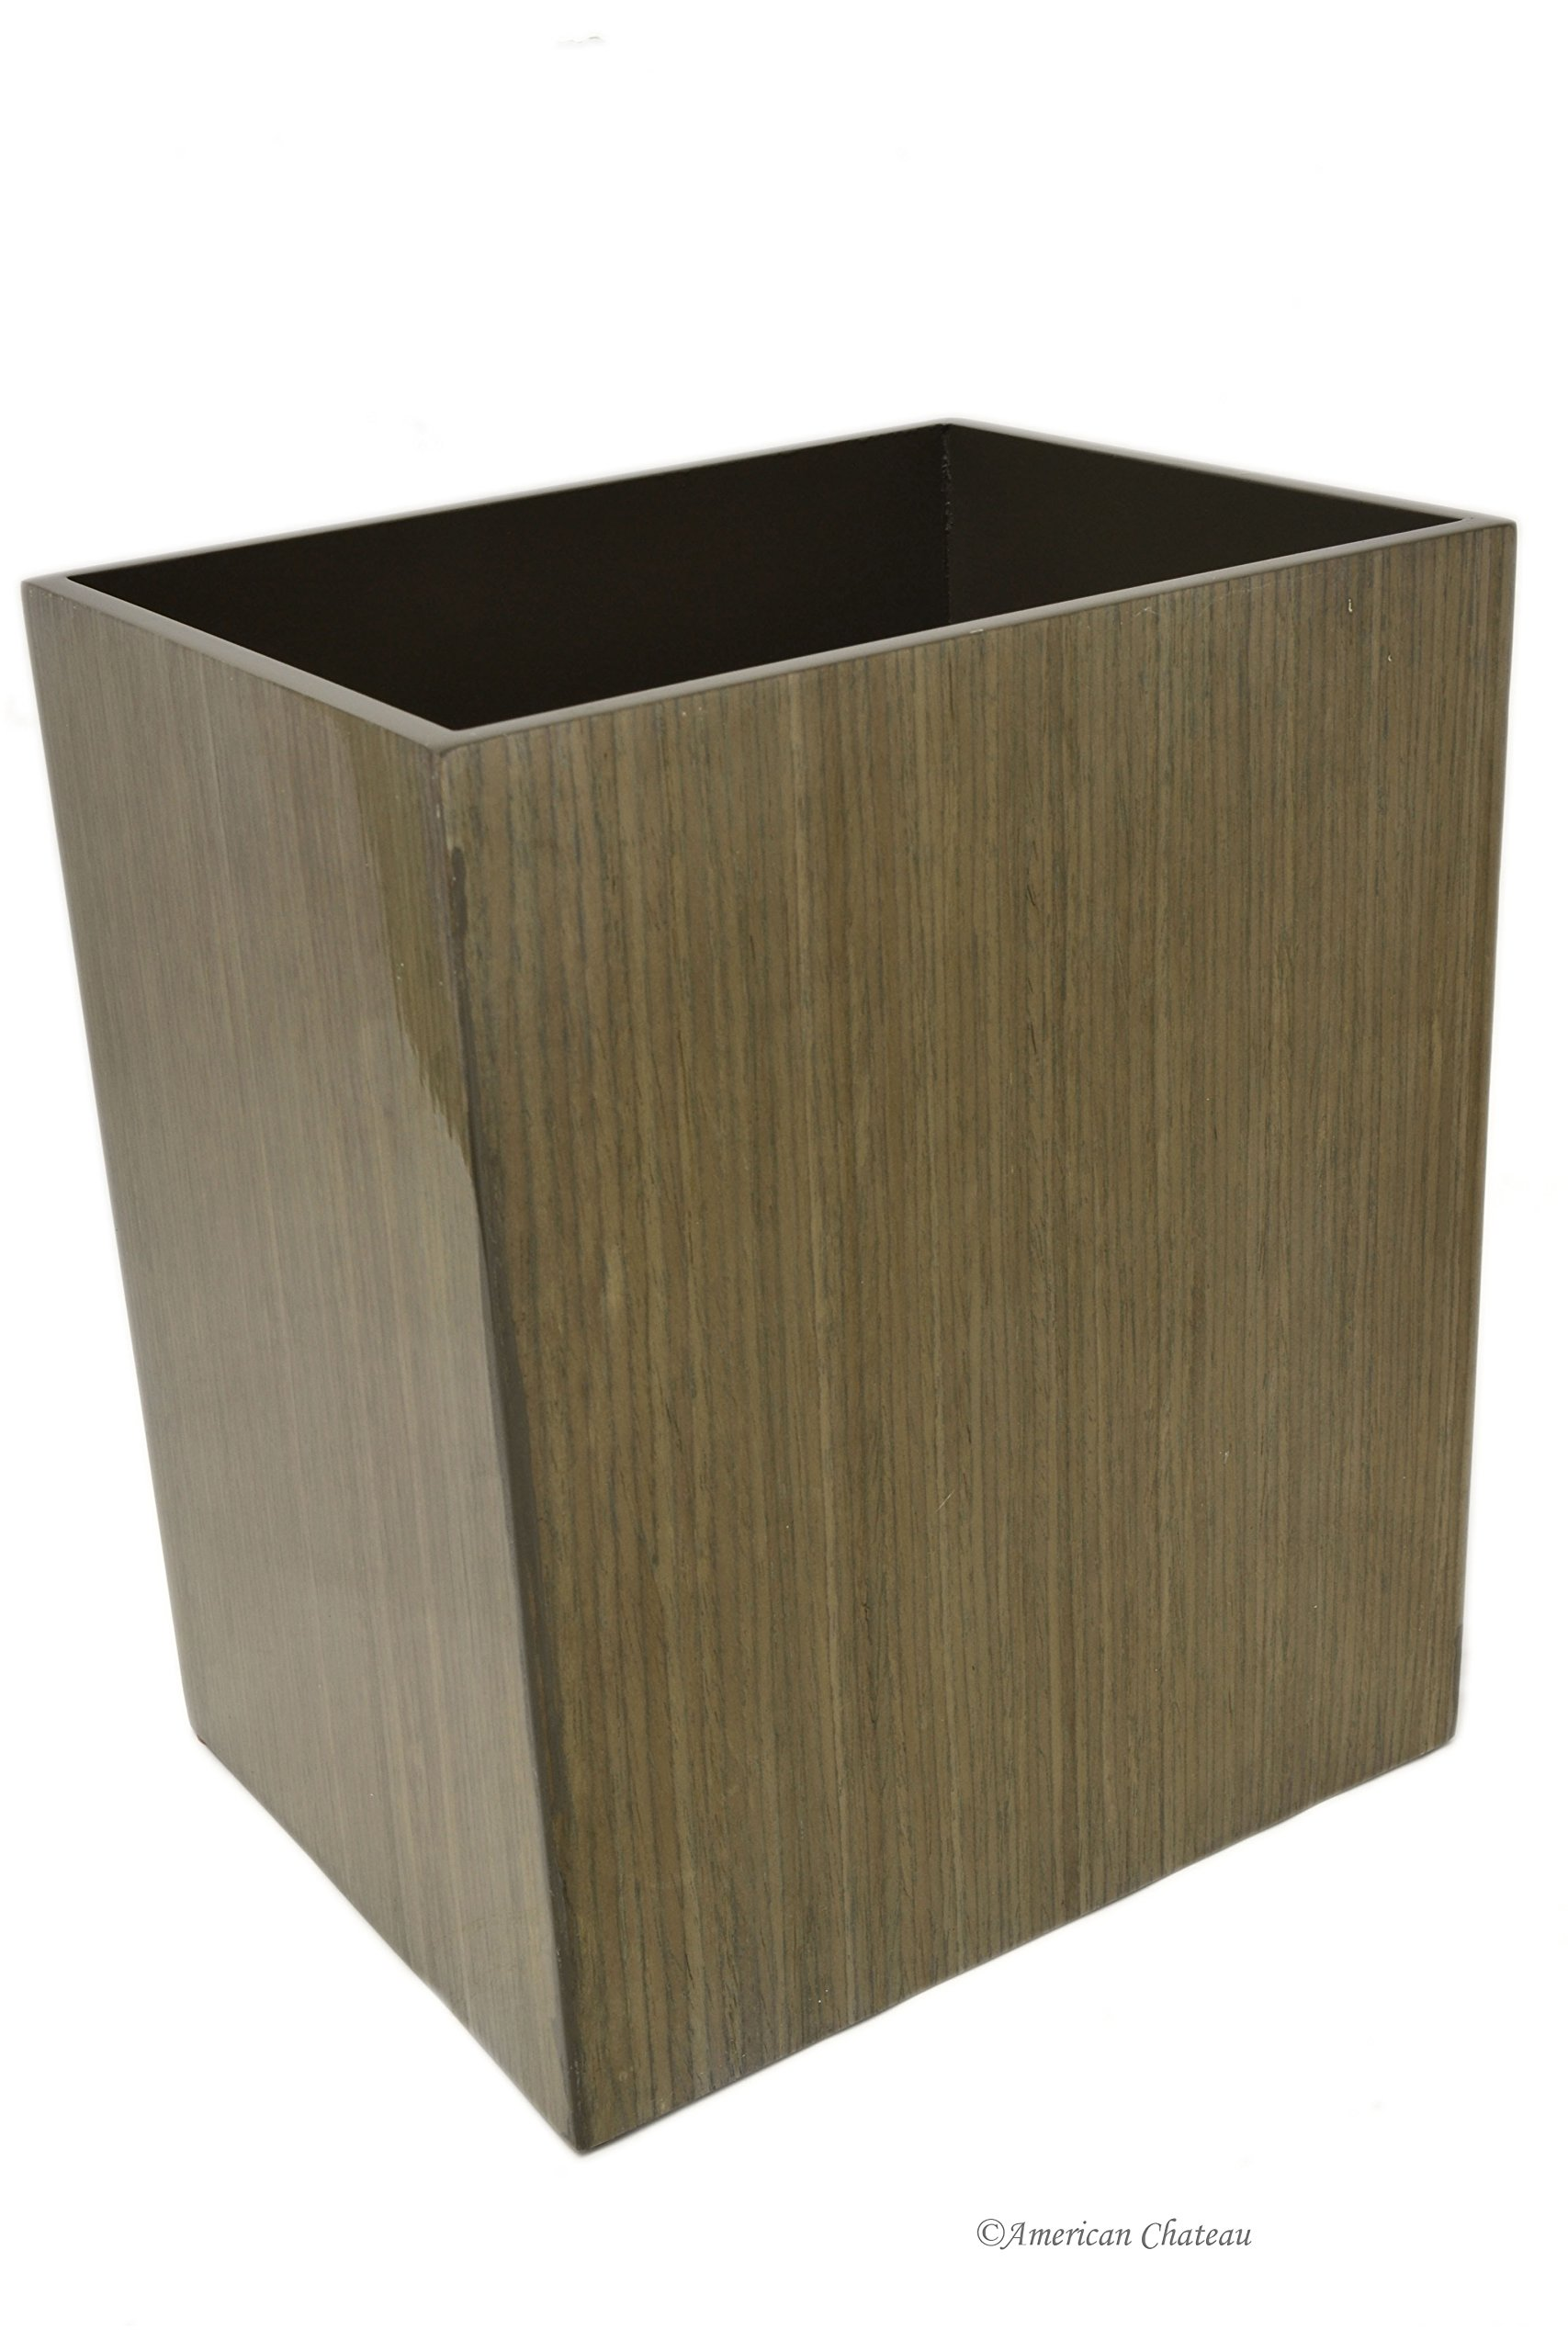 American Chateau Rectangular Large MDF Wood Walnut Veneer Waste Basket/Garbage Can Bin